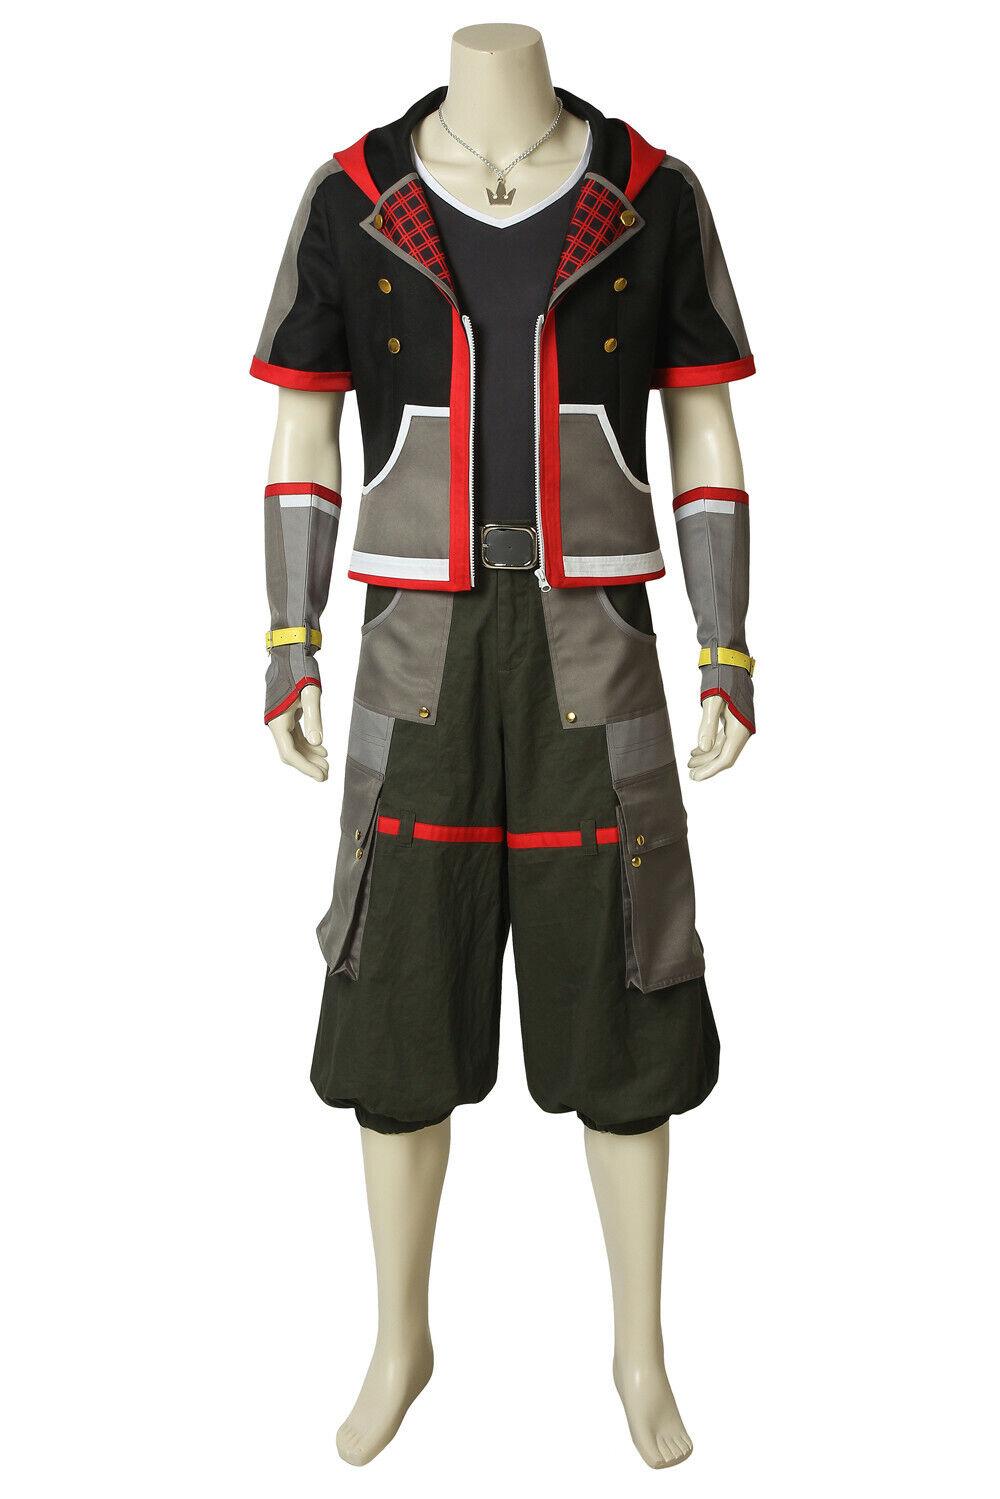 Sora Wisdom Form Kingdom Hearts 2 cosplay costume Custom Made Halloween:ry7